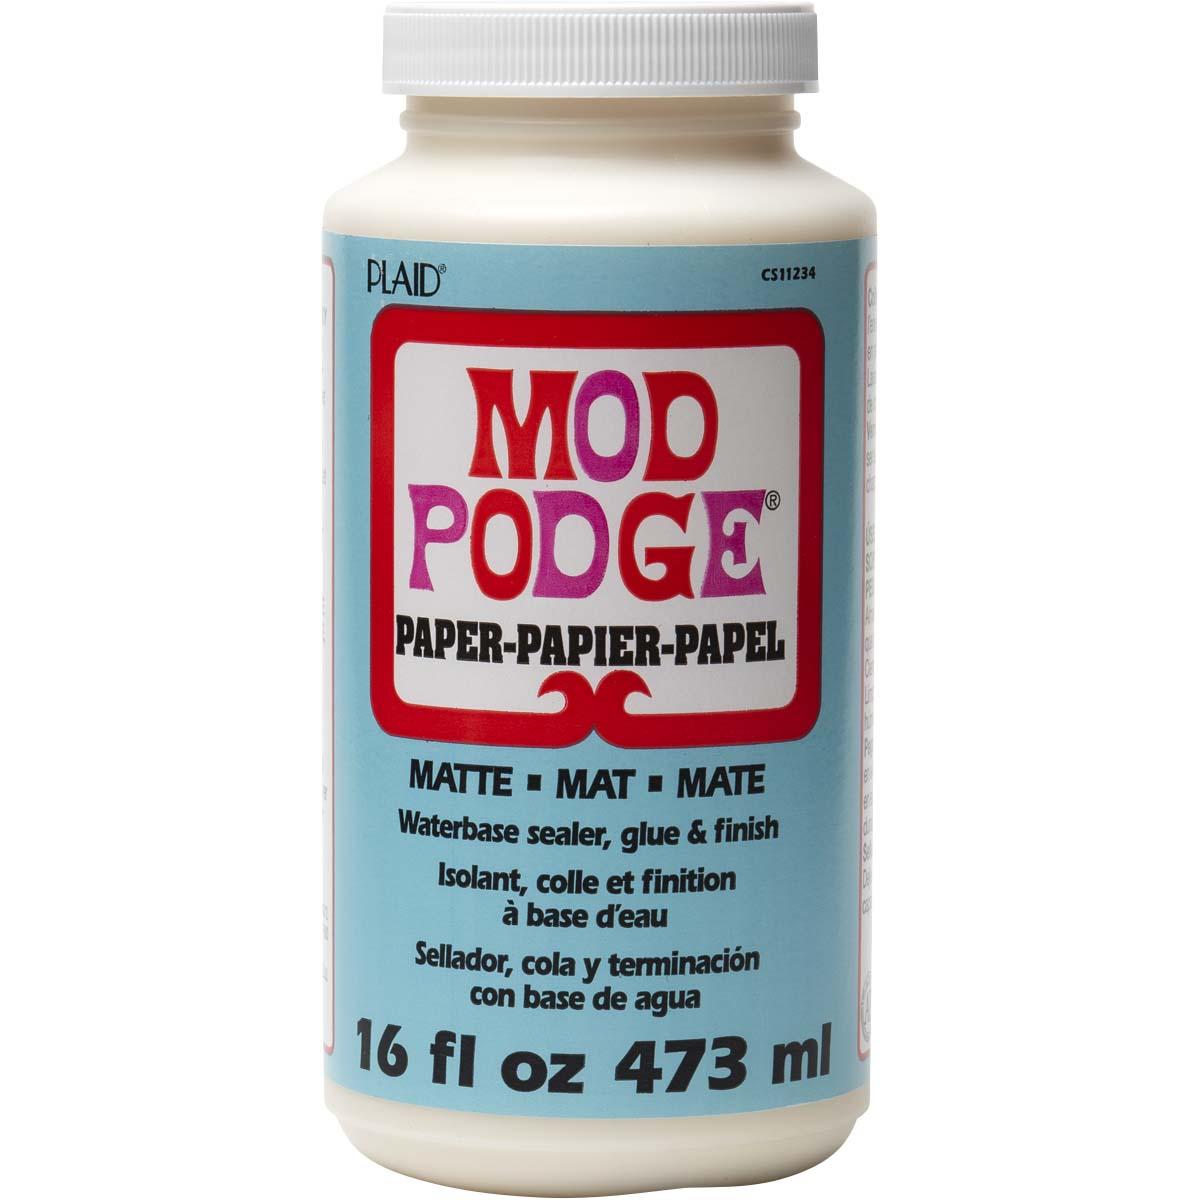 Mod Podge ® Paper - Matte, 16 oz.